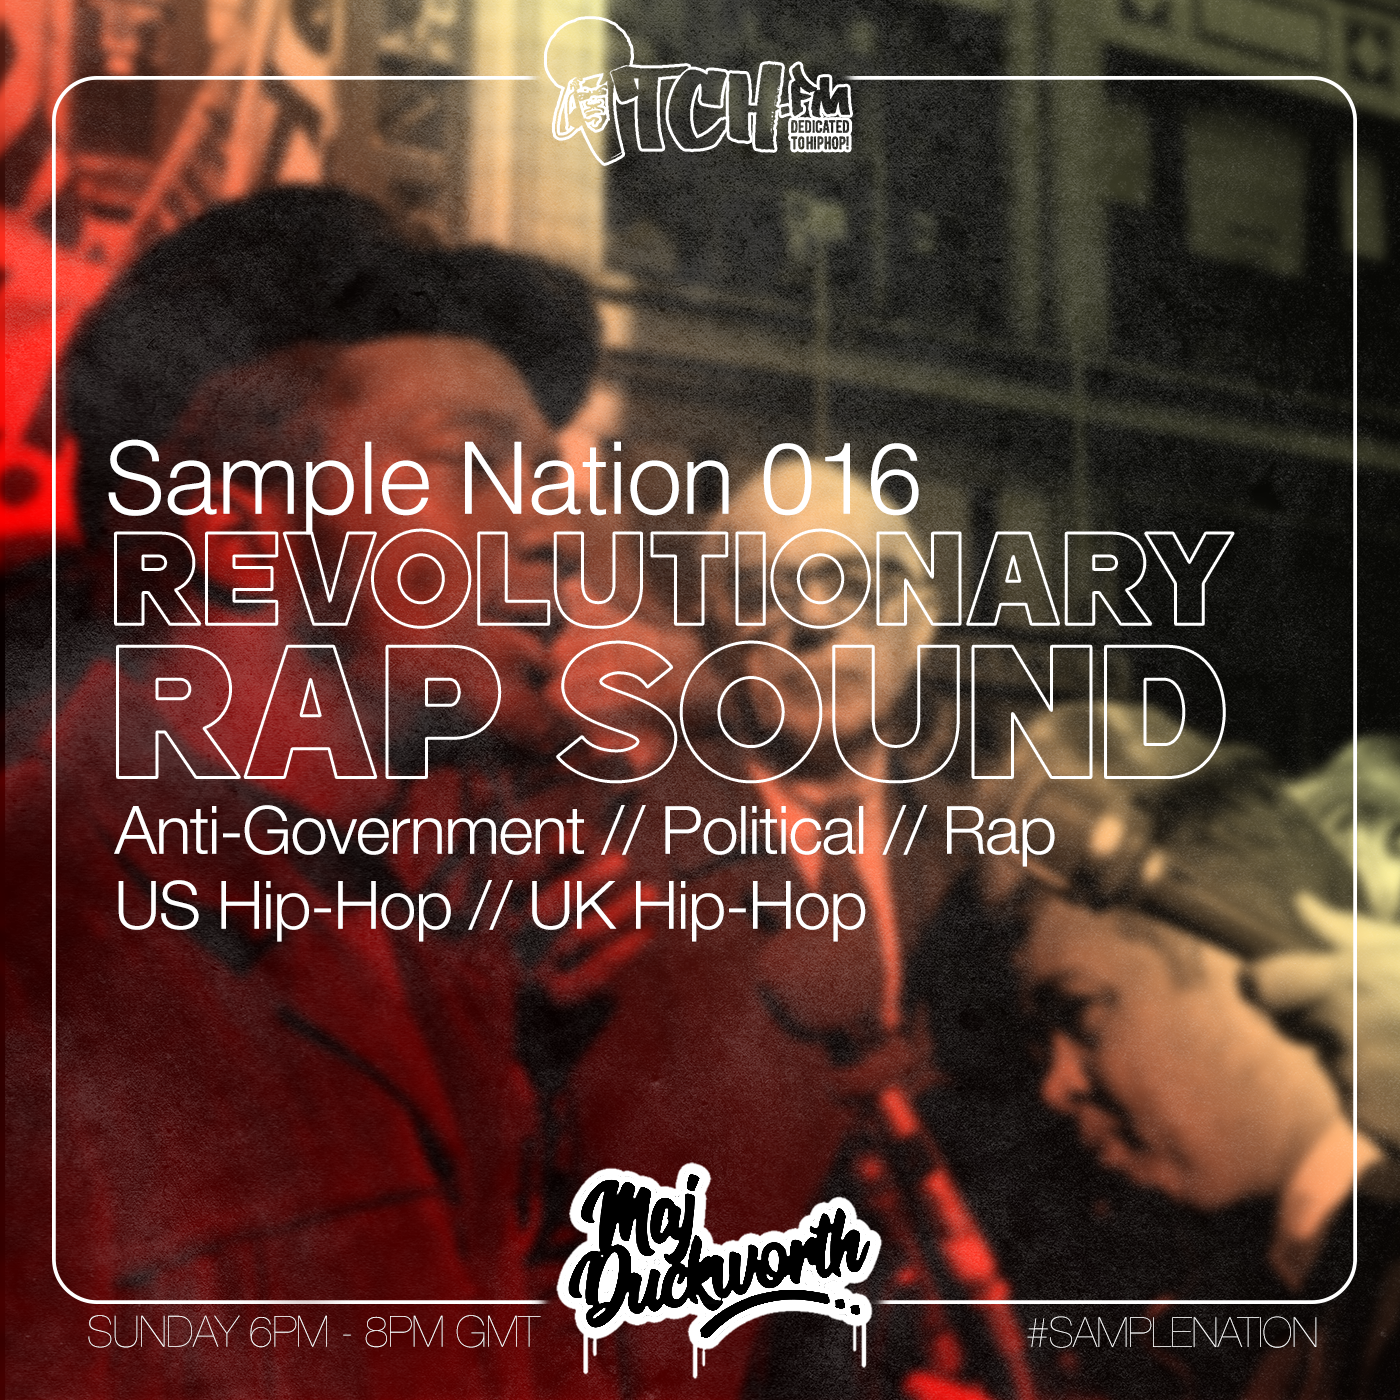 Sample Nation 016 - Revolutionary Rap Sound